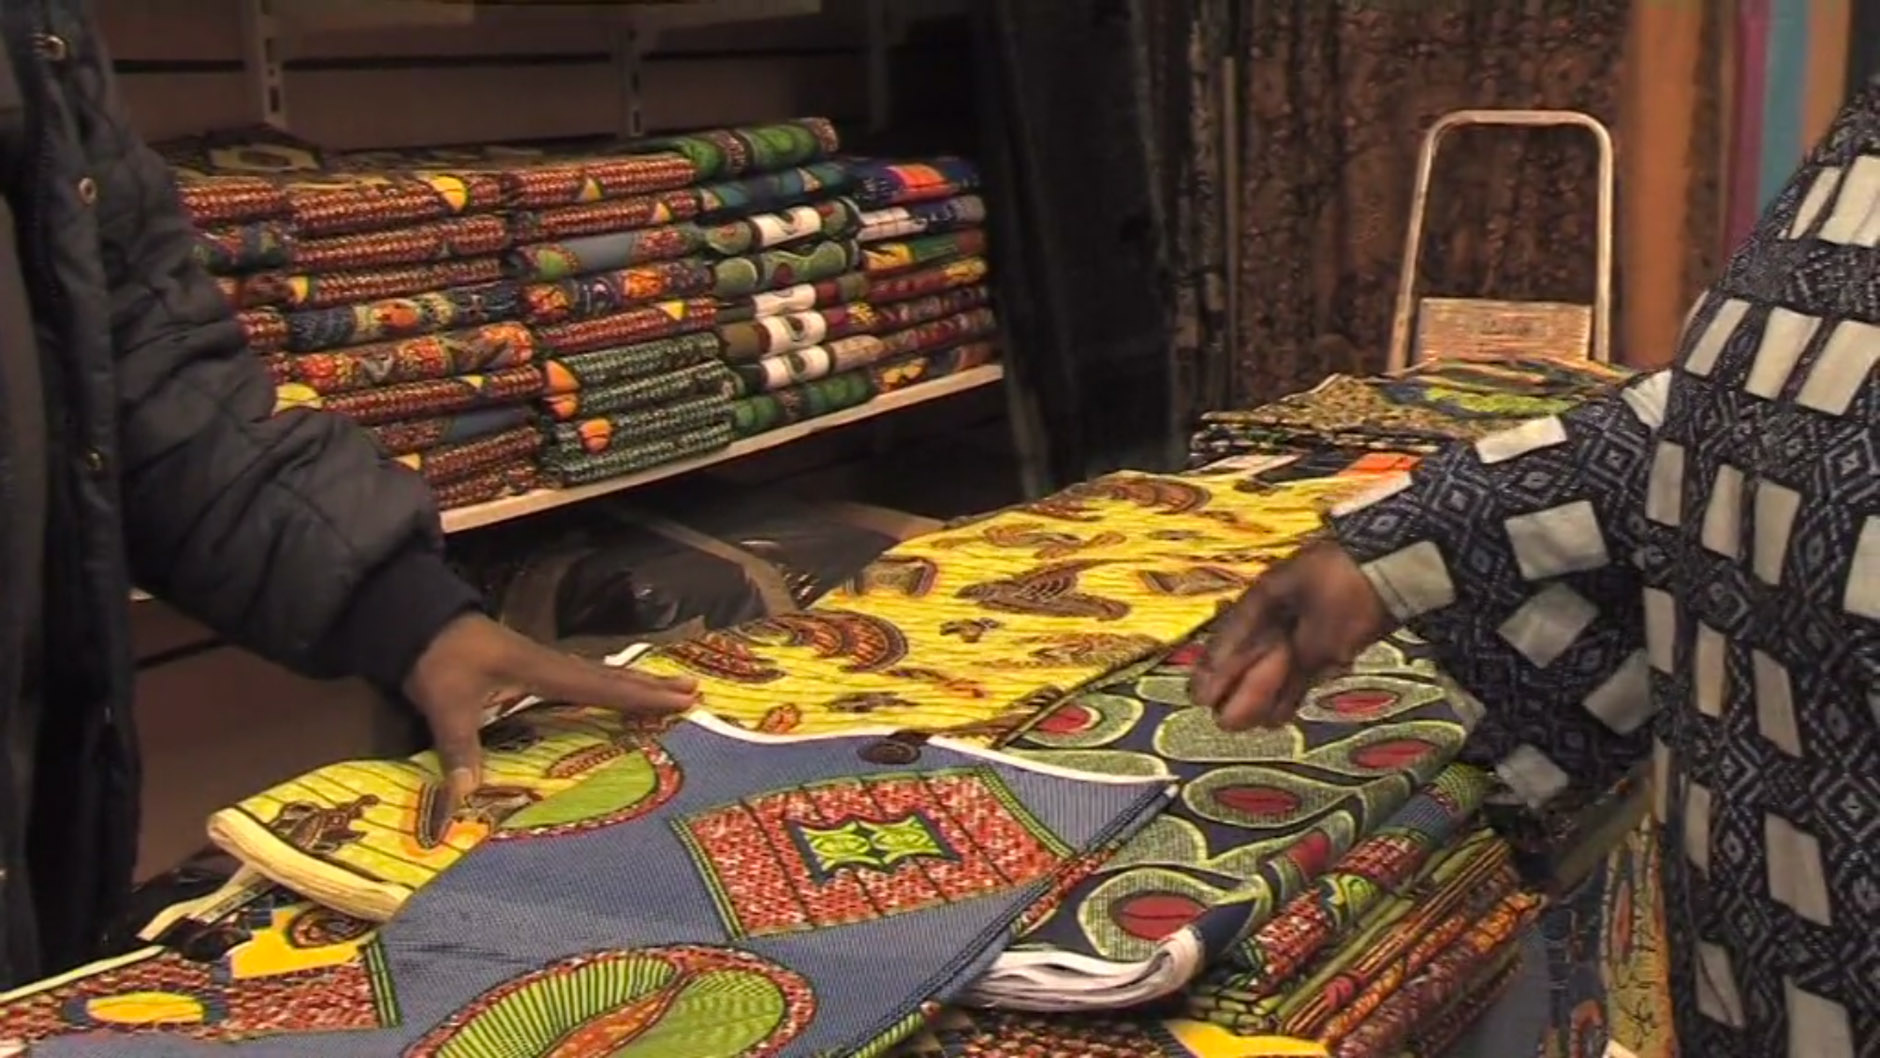 Intoart, Whitechapel Films, Mawuena Kattah